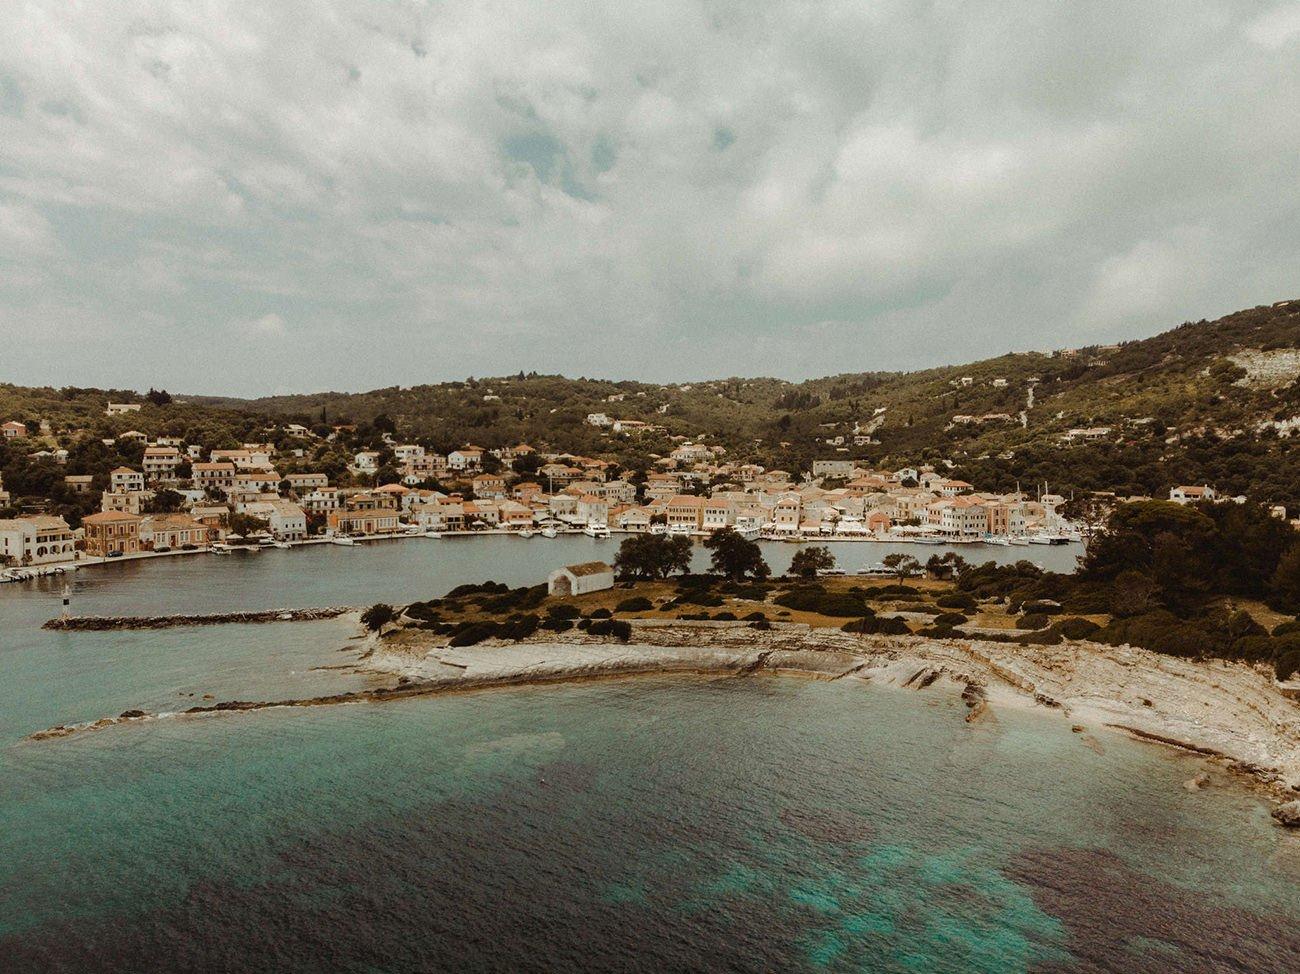 Breathtaking aerial view of Paxos island